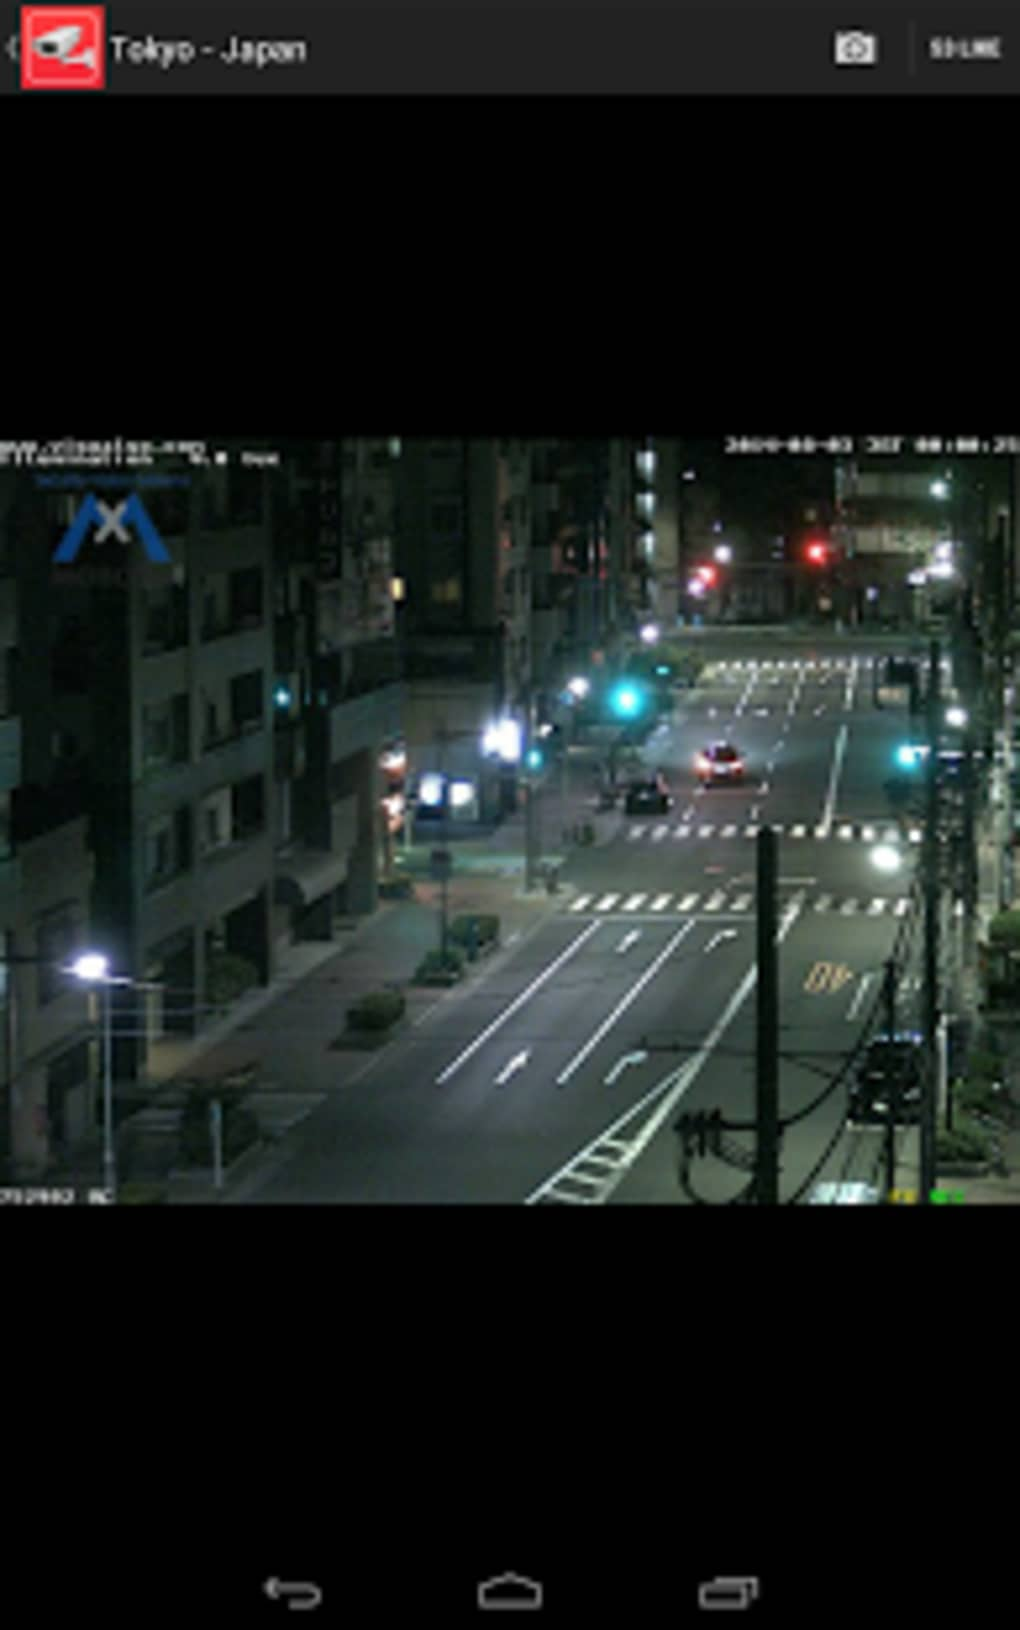 Vivo Camera Viewer: Camaras IP for Android - Download